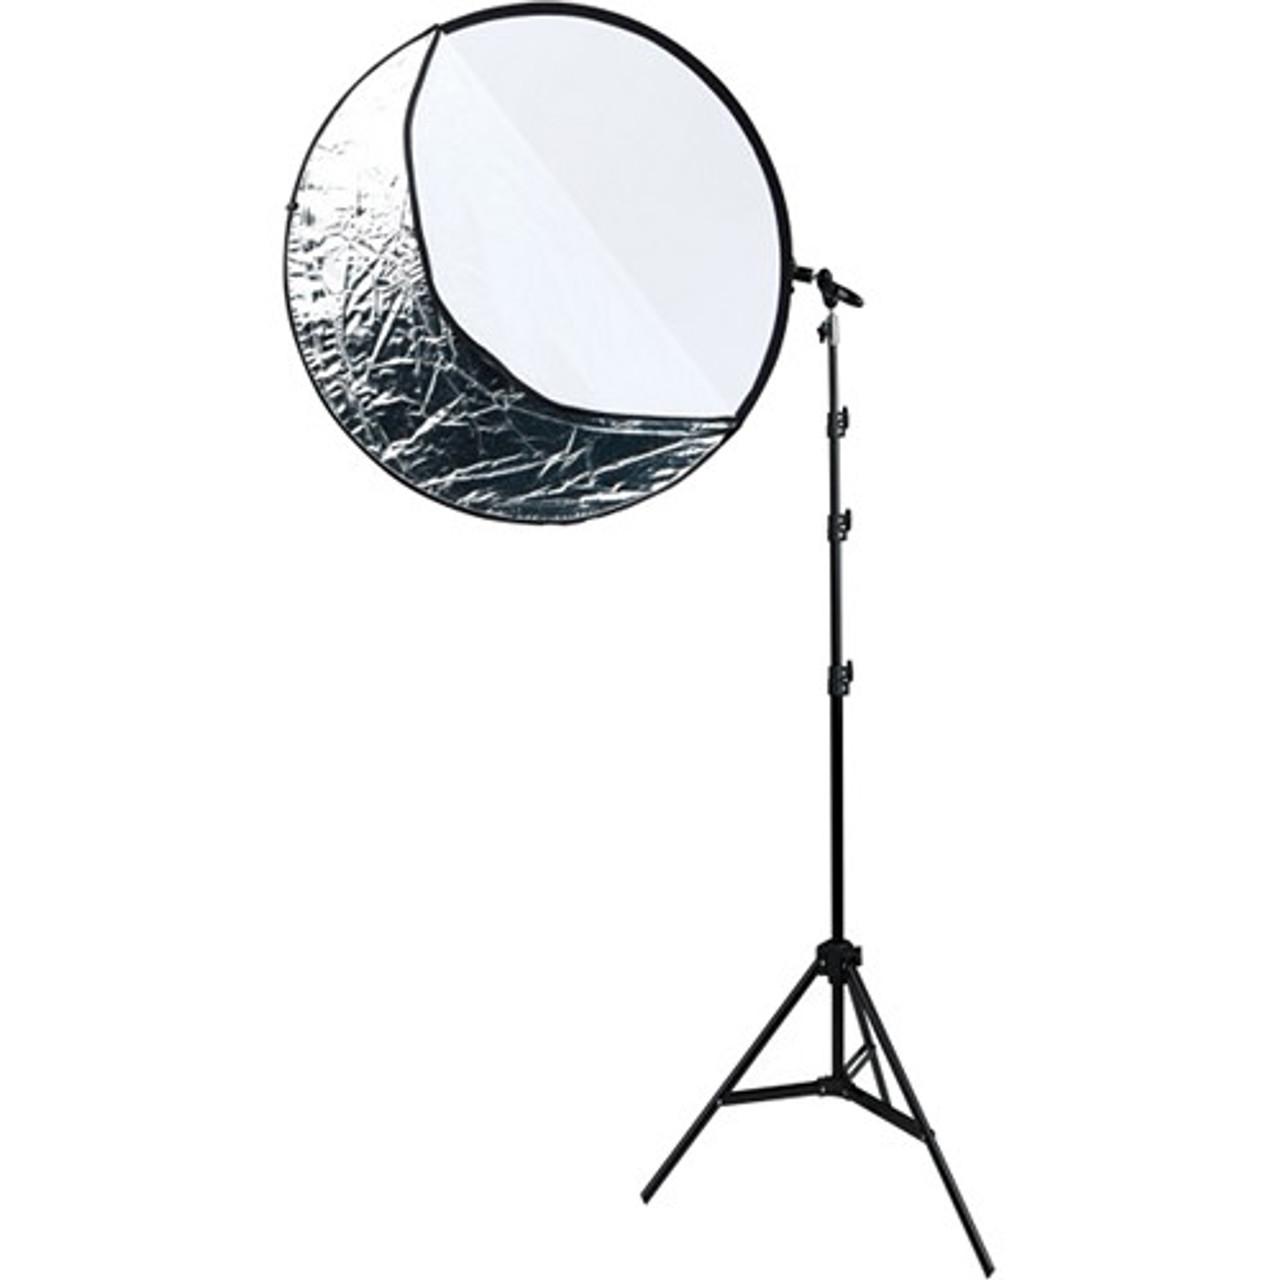 Westcott Basics 40 9-in-1 Reflector